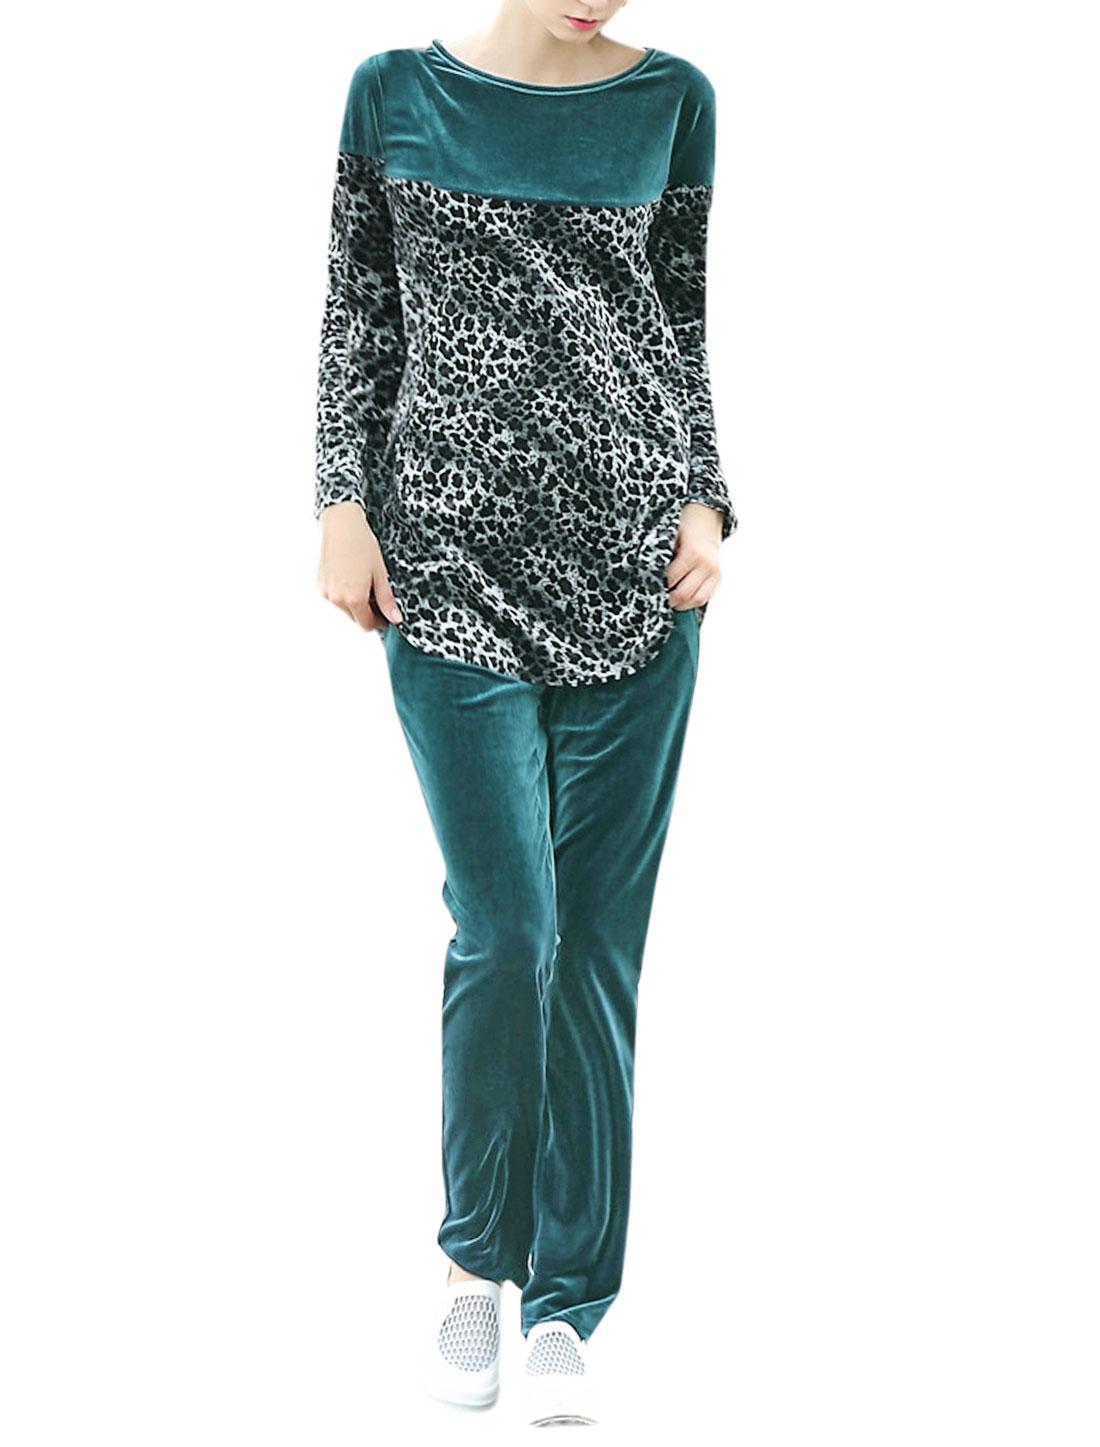 Women Color Block Leopard Print Velvet Loose Tunic Top w Pants Sets Green XS